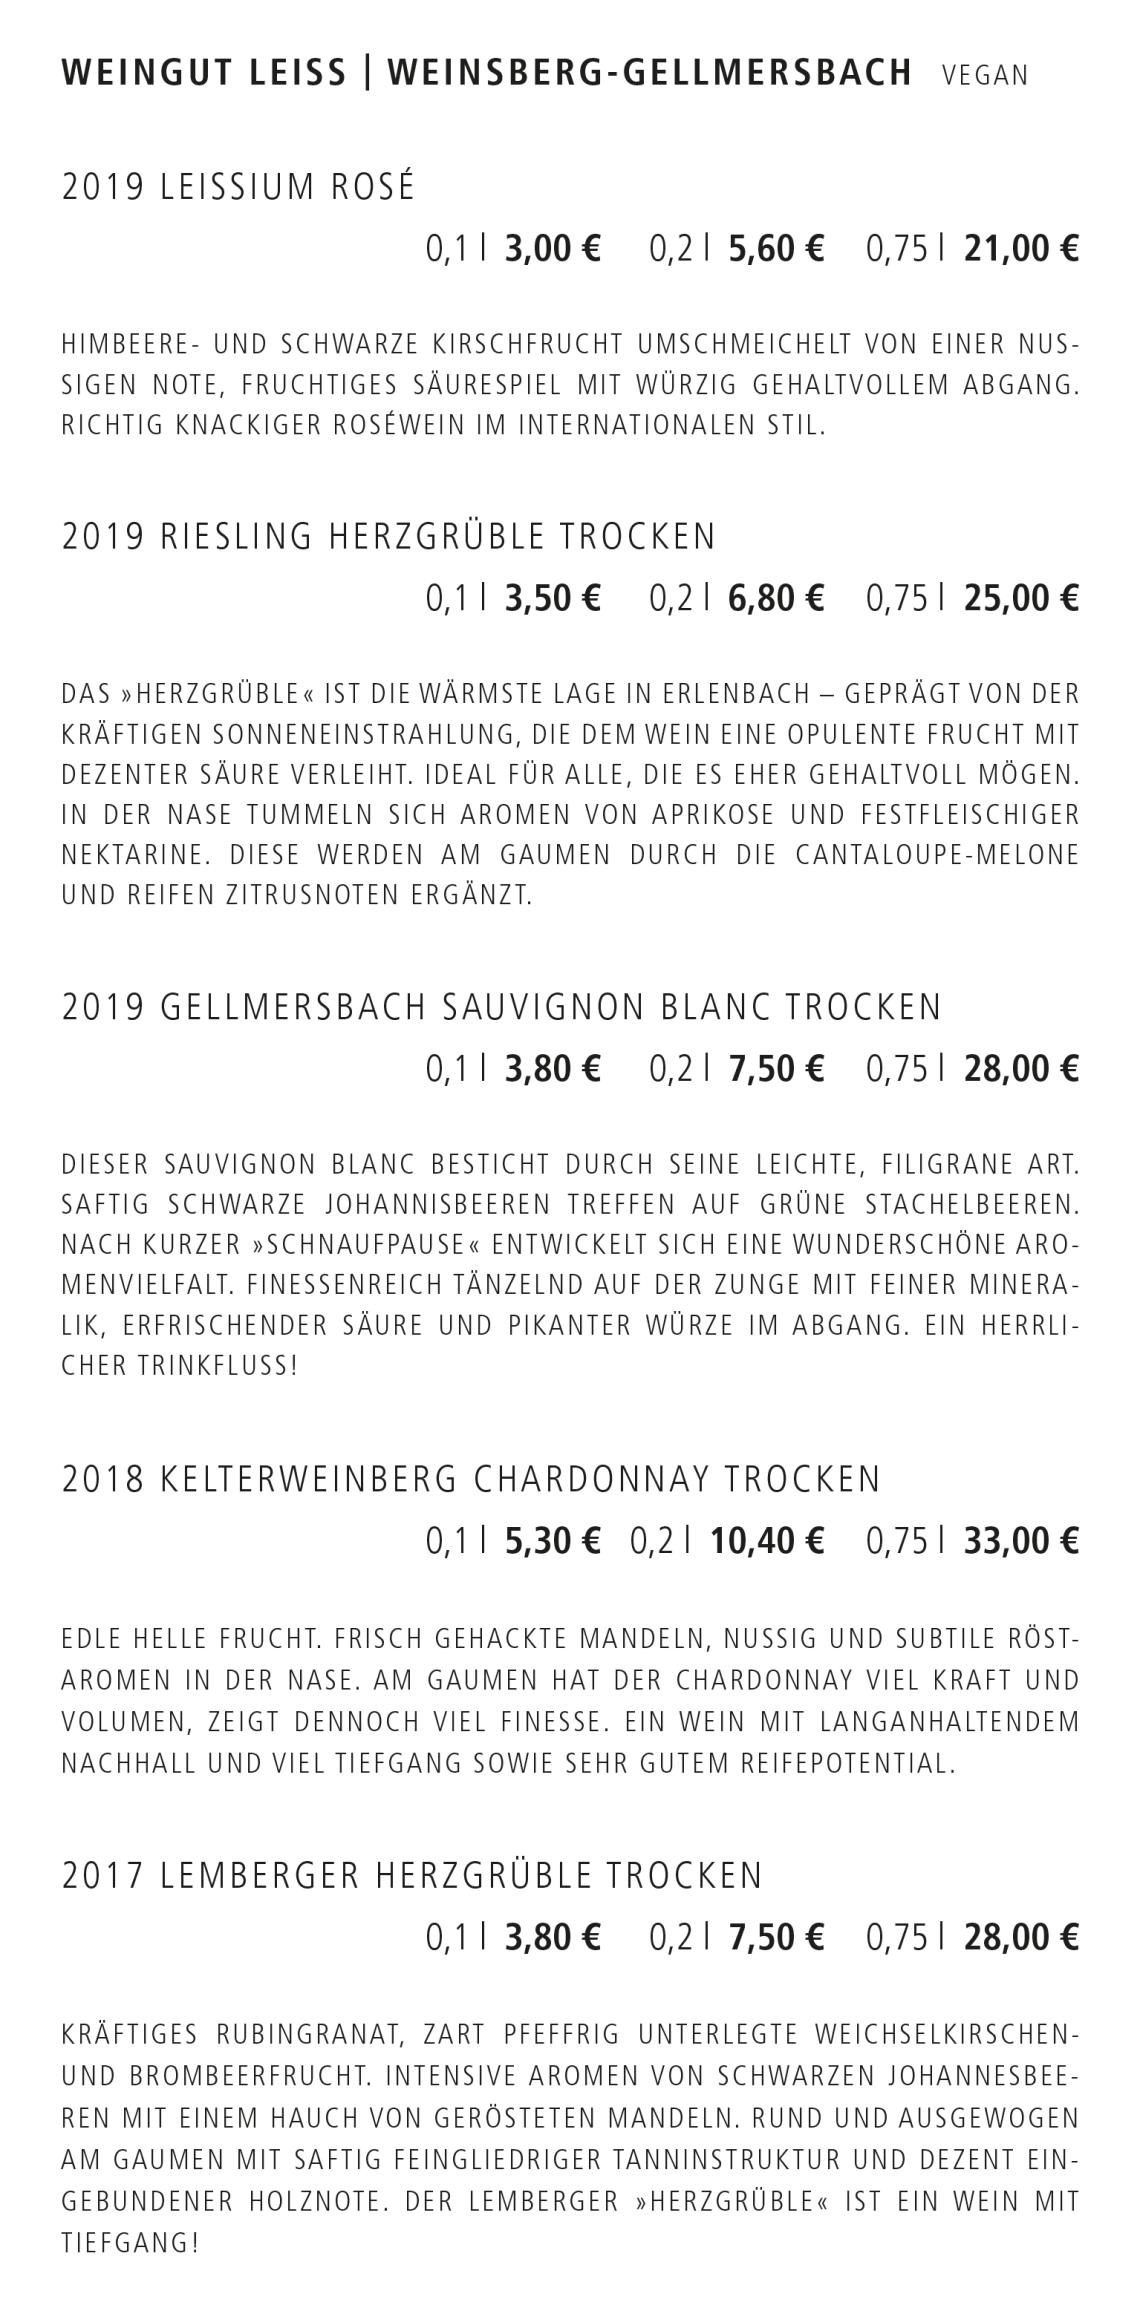 10_Weingut Leiss_Weinsberg-Gellmersbach